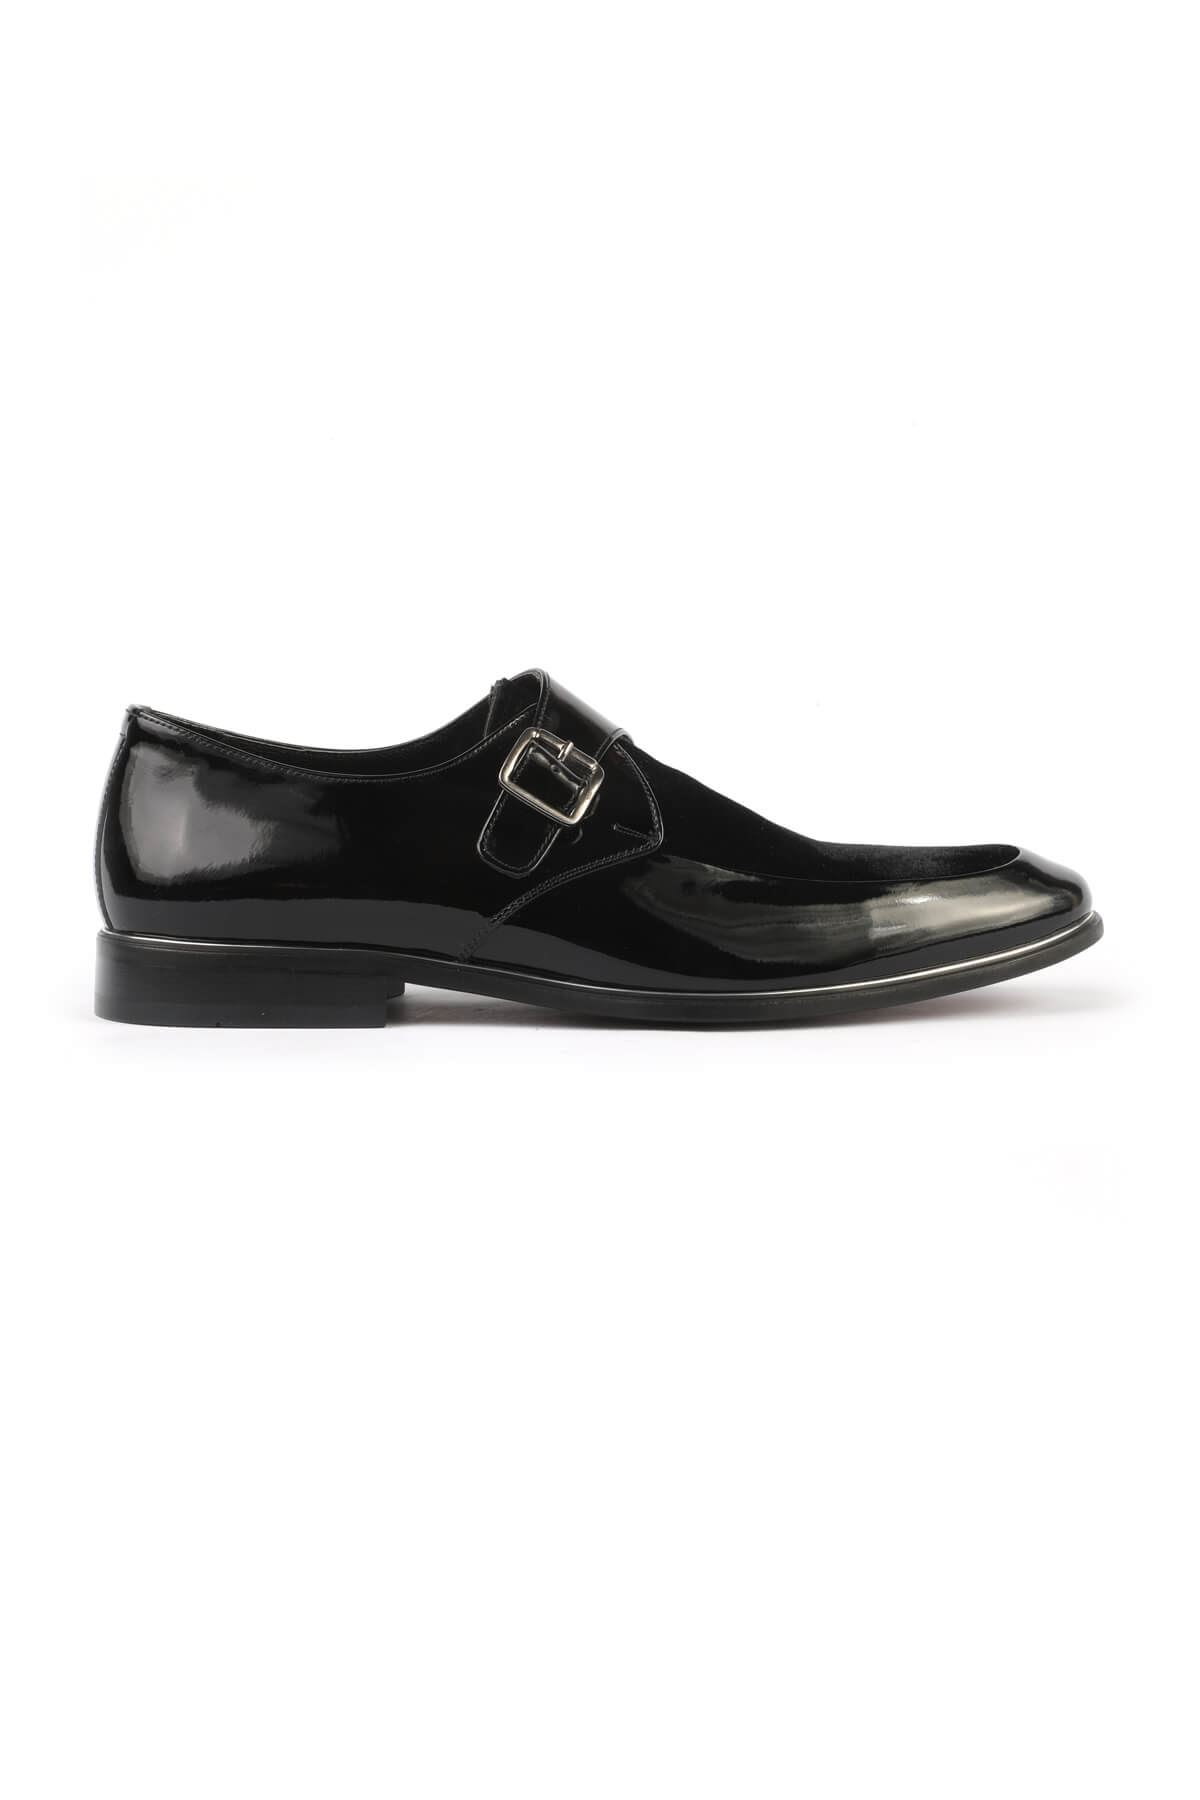 Libero 2542 Black Classic Shoes